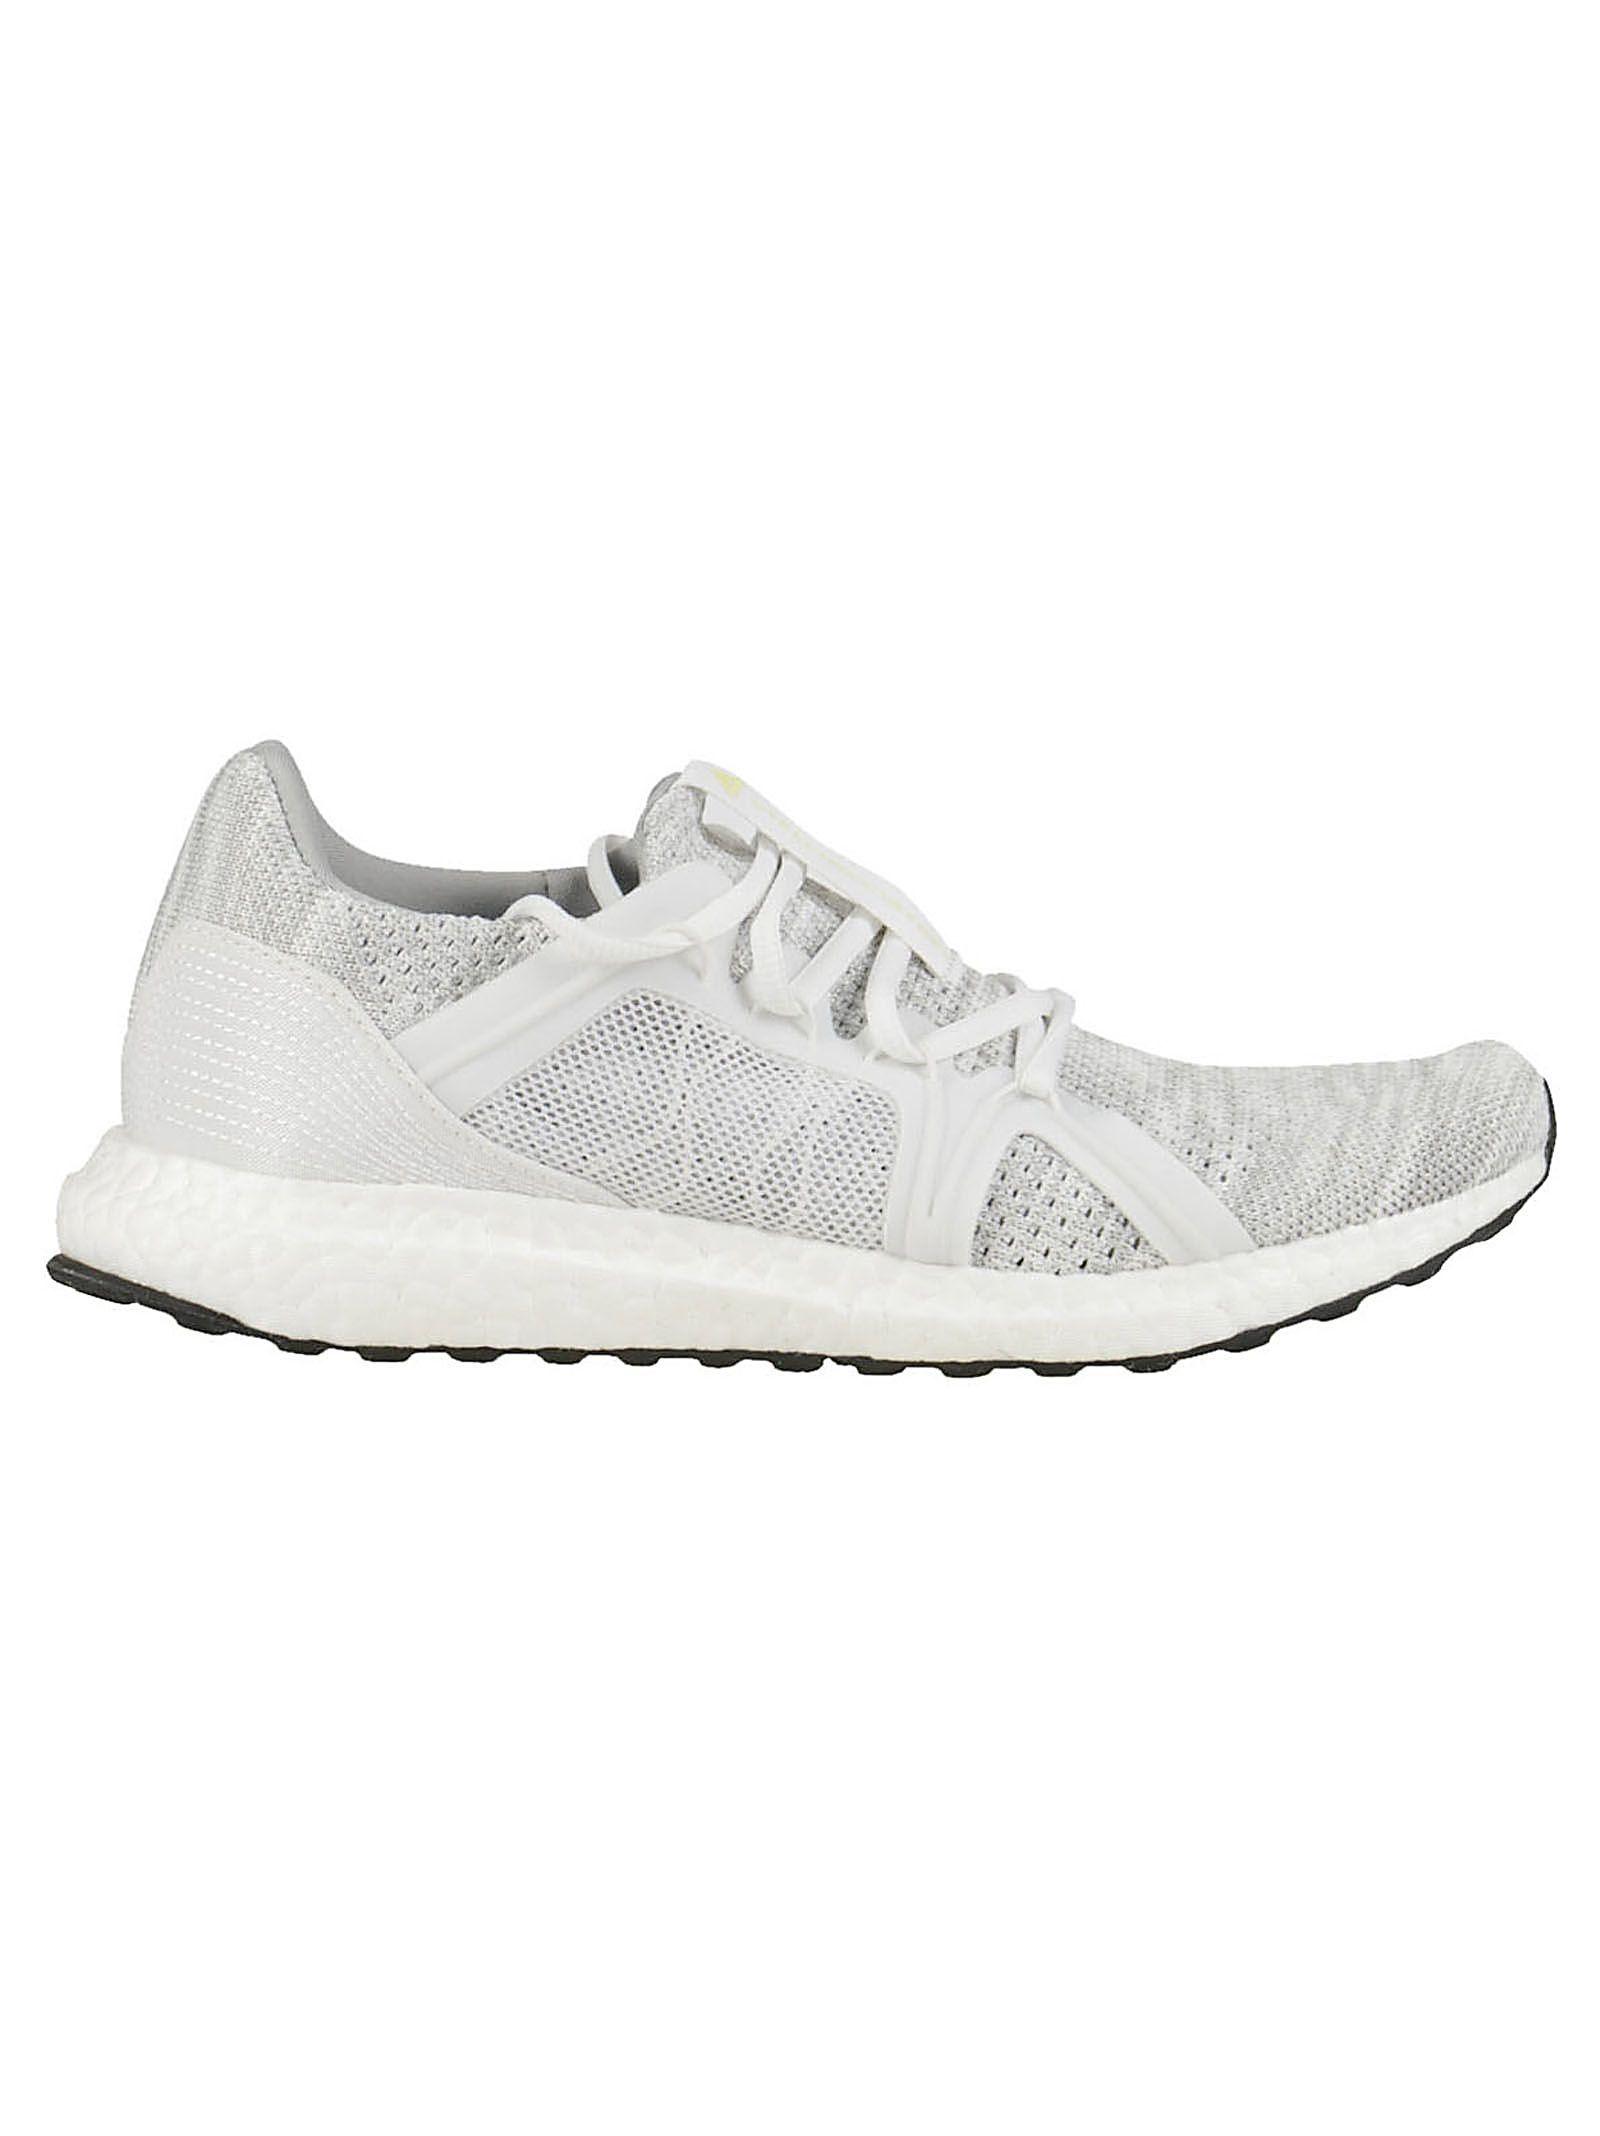 Adidas Da Stella Mccartney Adidas Da Stella Mccartney Ultraboost